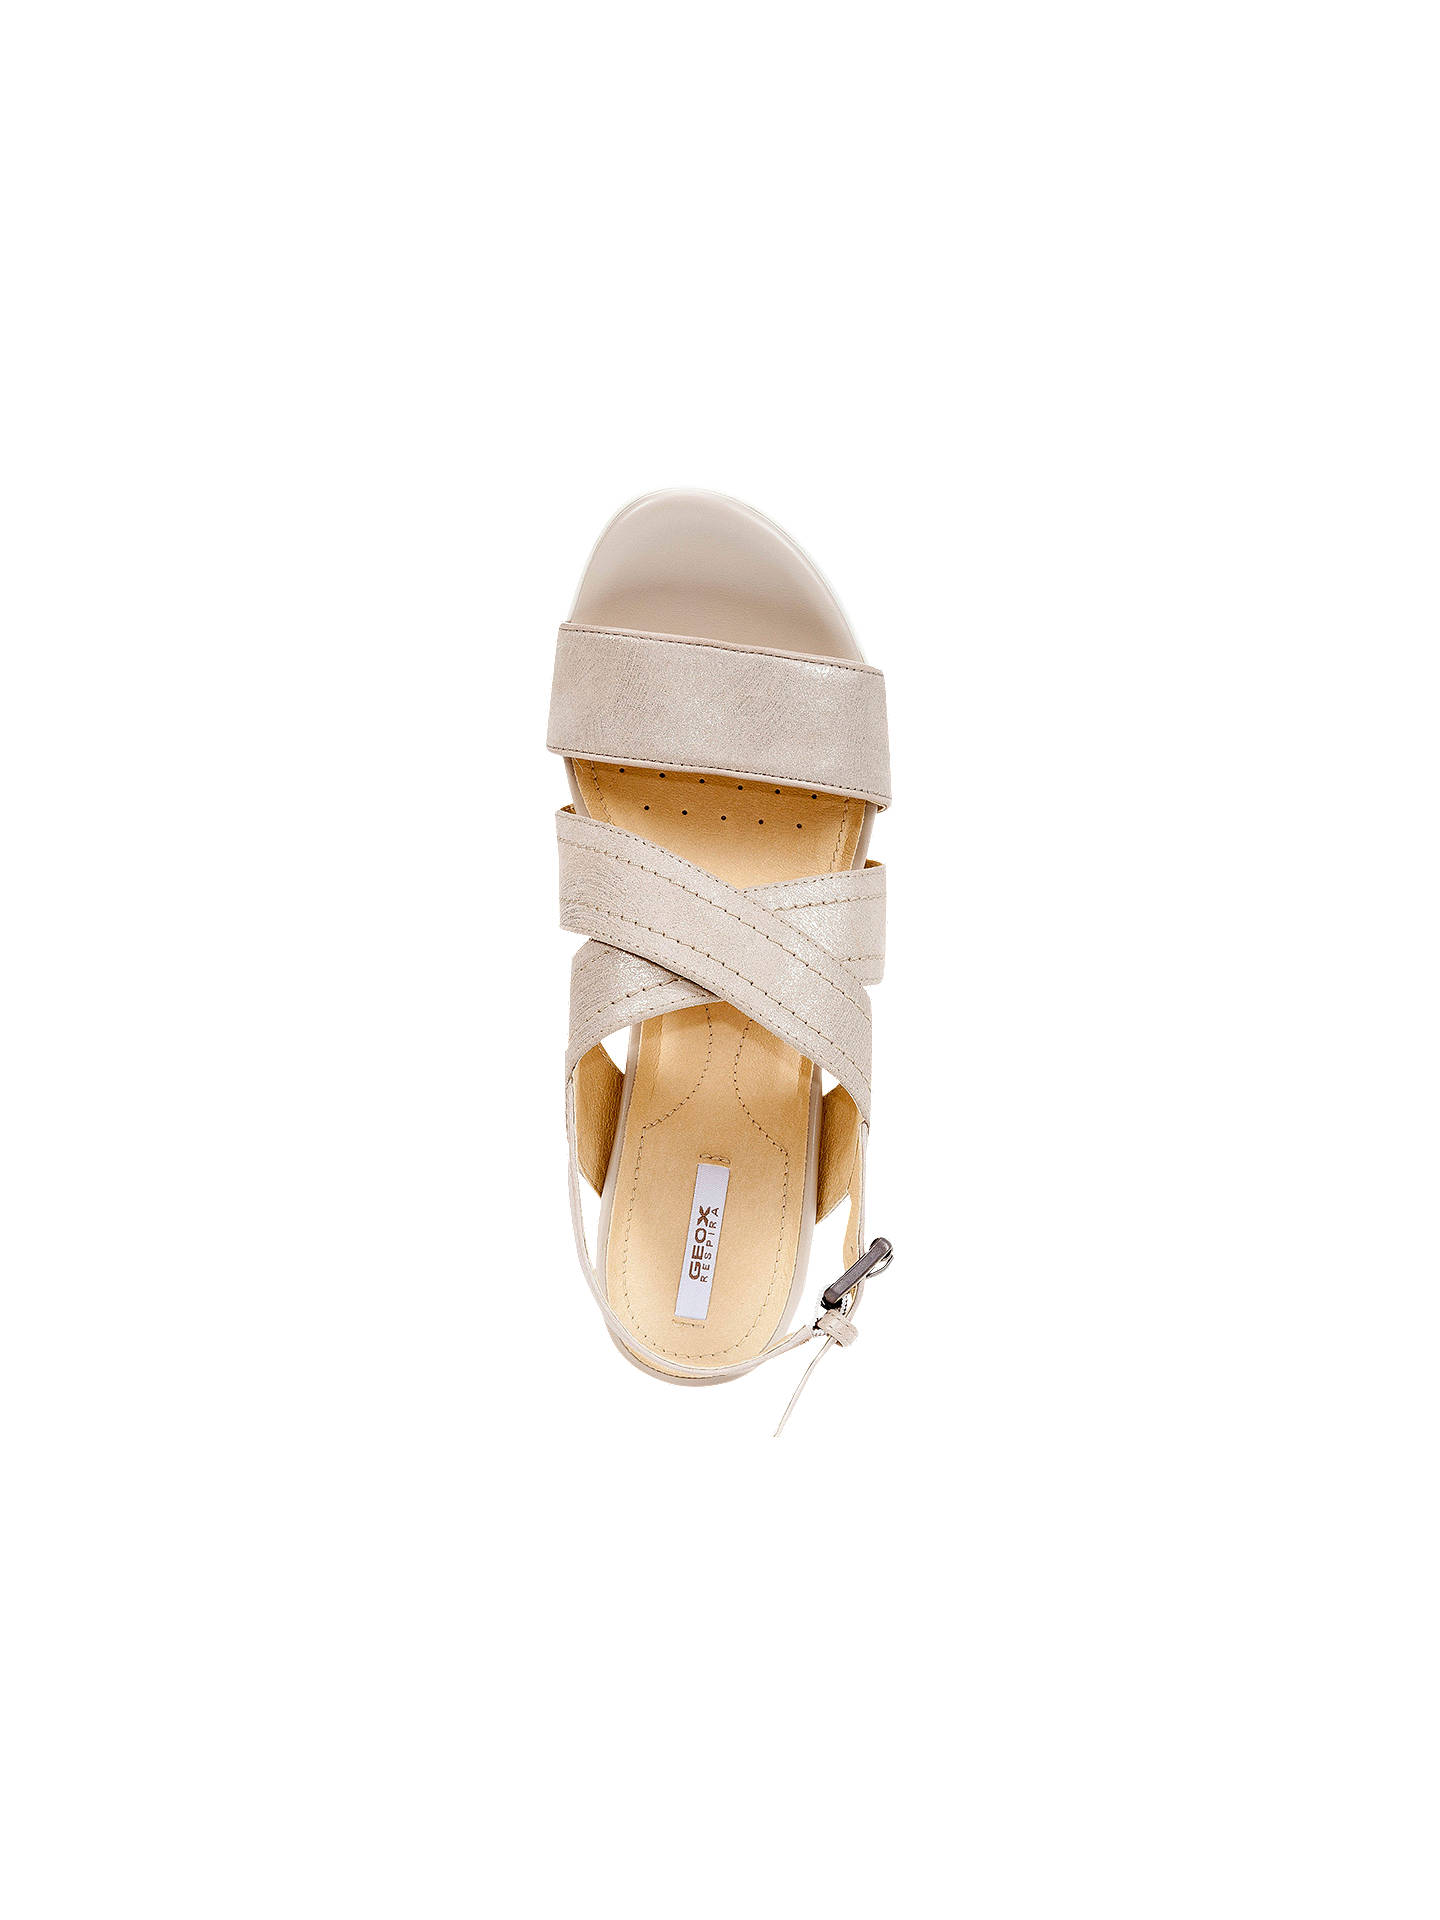 Geox Mary Karmen Cross Strap Wedge Heel Sandals Gold